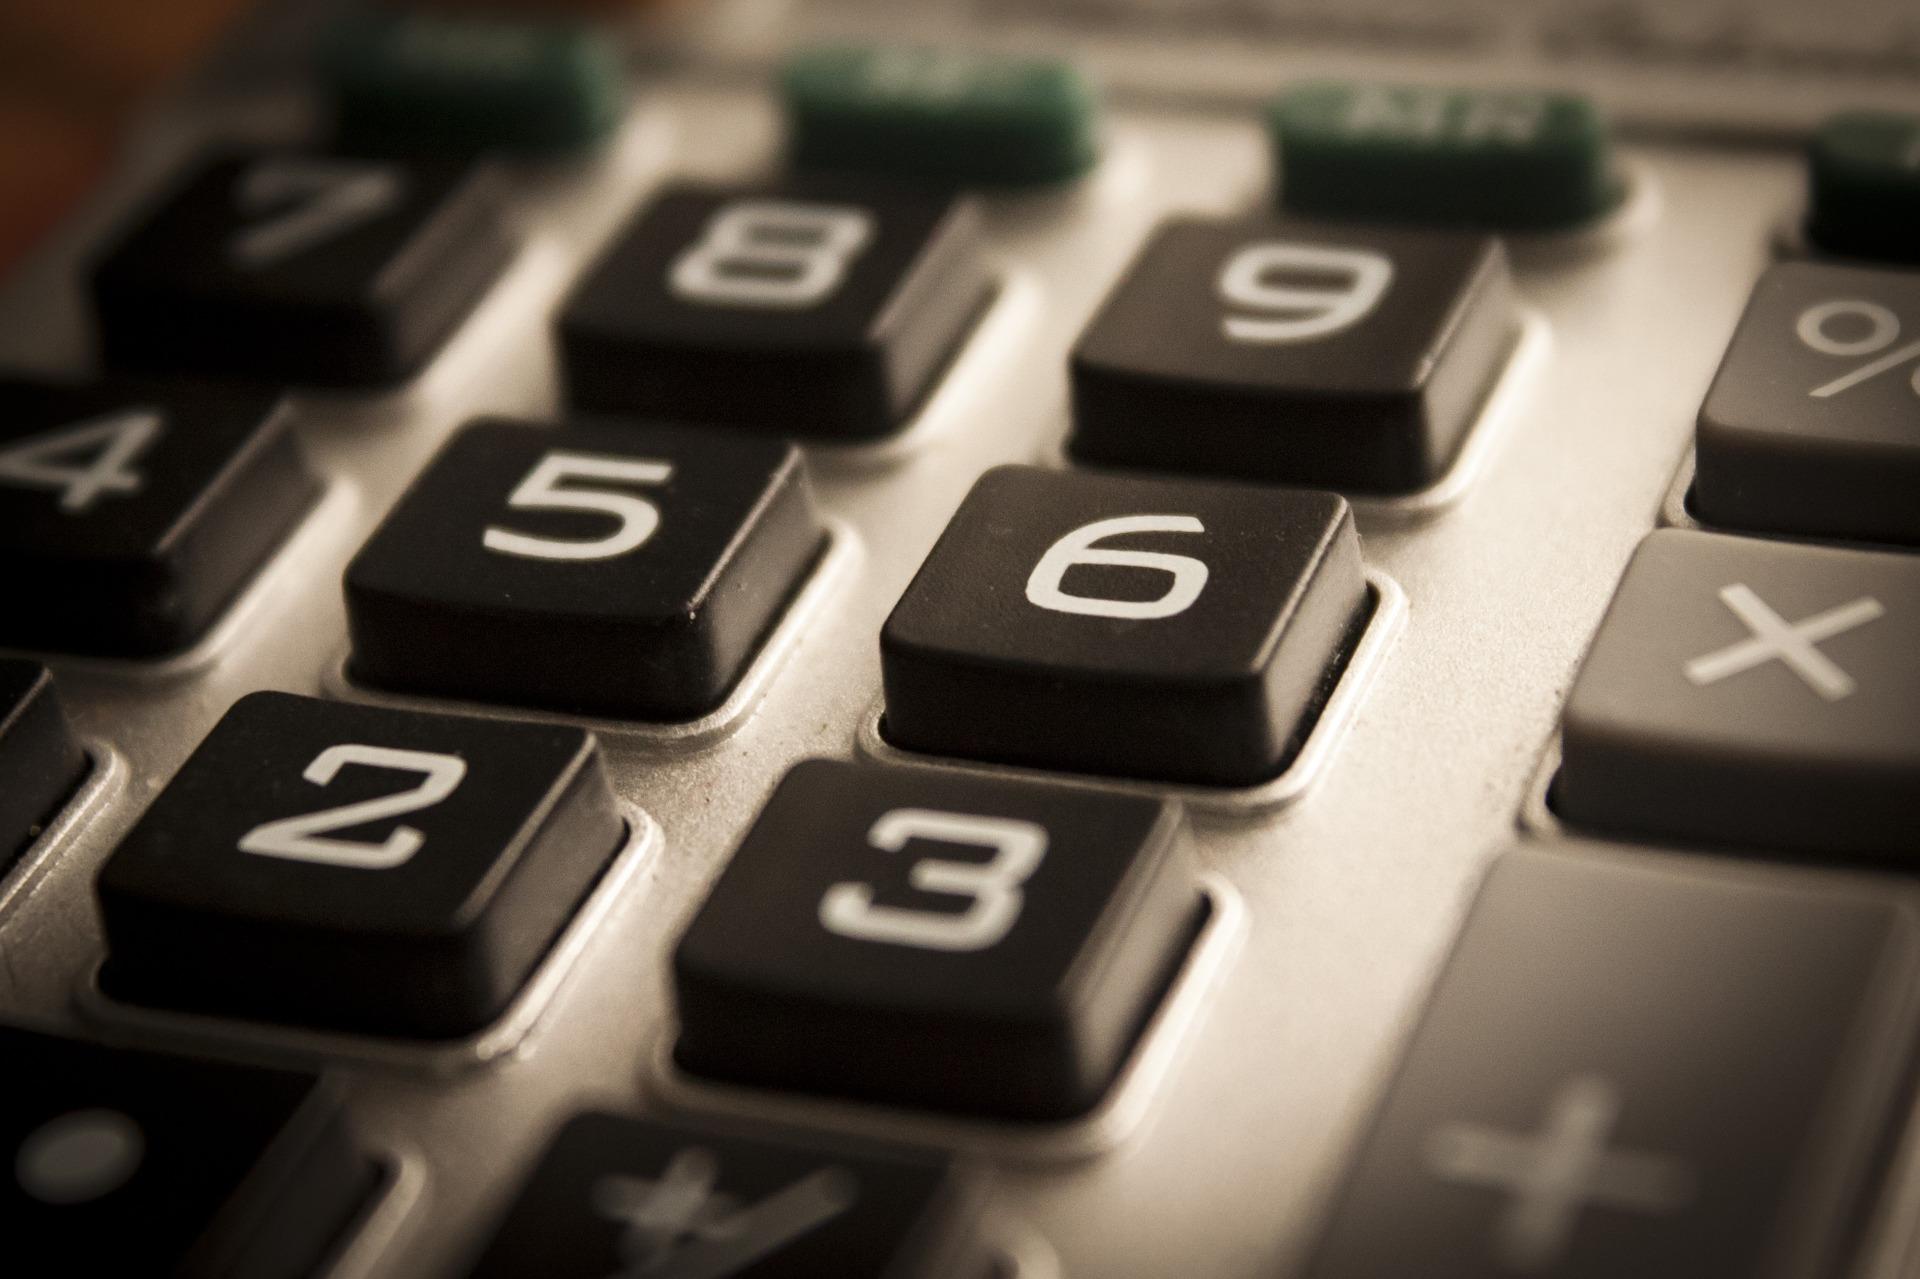 Calculator keys close-up